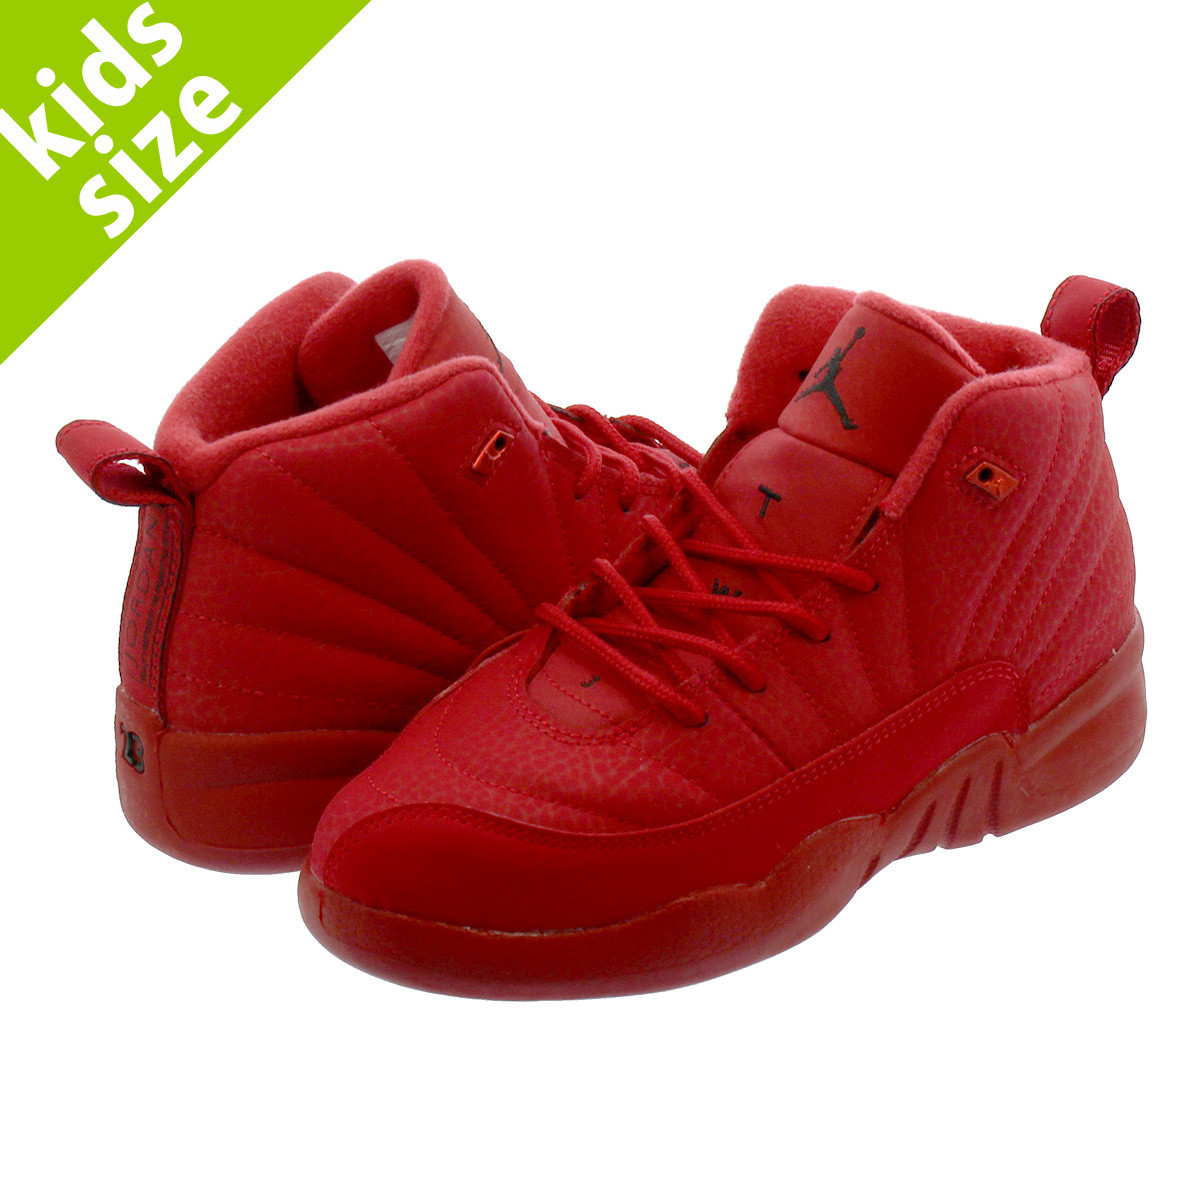 new arrival 6624e 392d2 NIKE AIR JORDAN 12 RETRO PS Nike Air Jordan 12 nostalgic PS GYM  RED/BLACK/BLACK 151,186-601